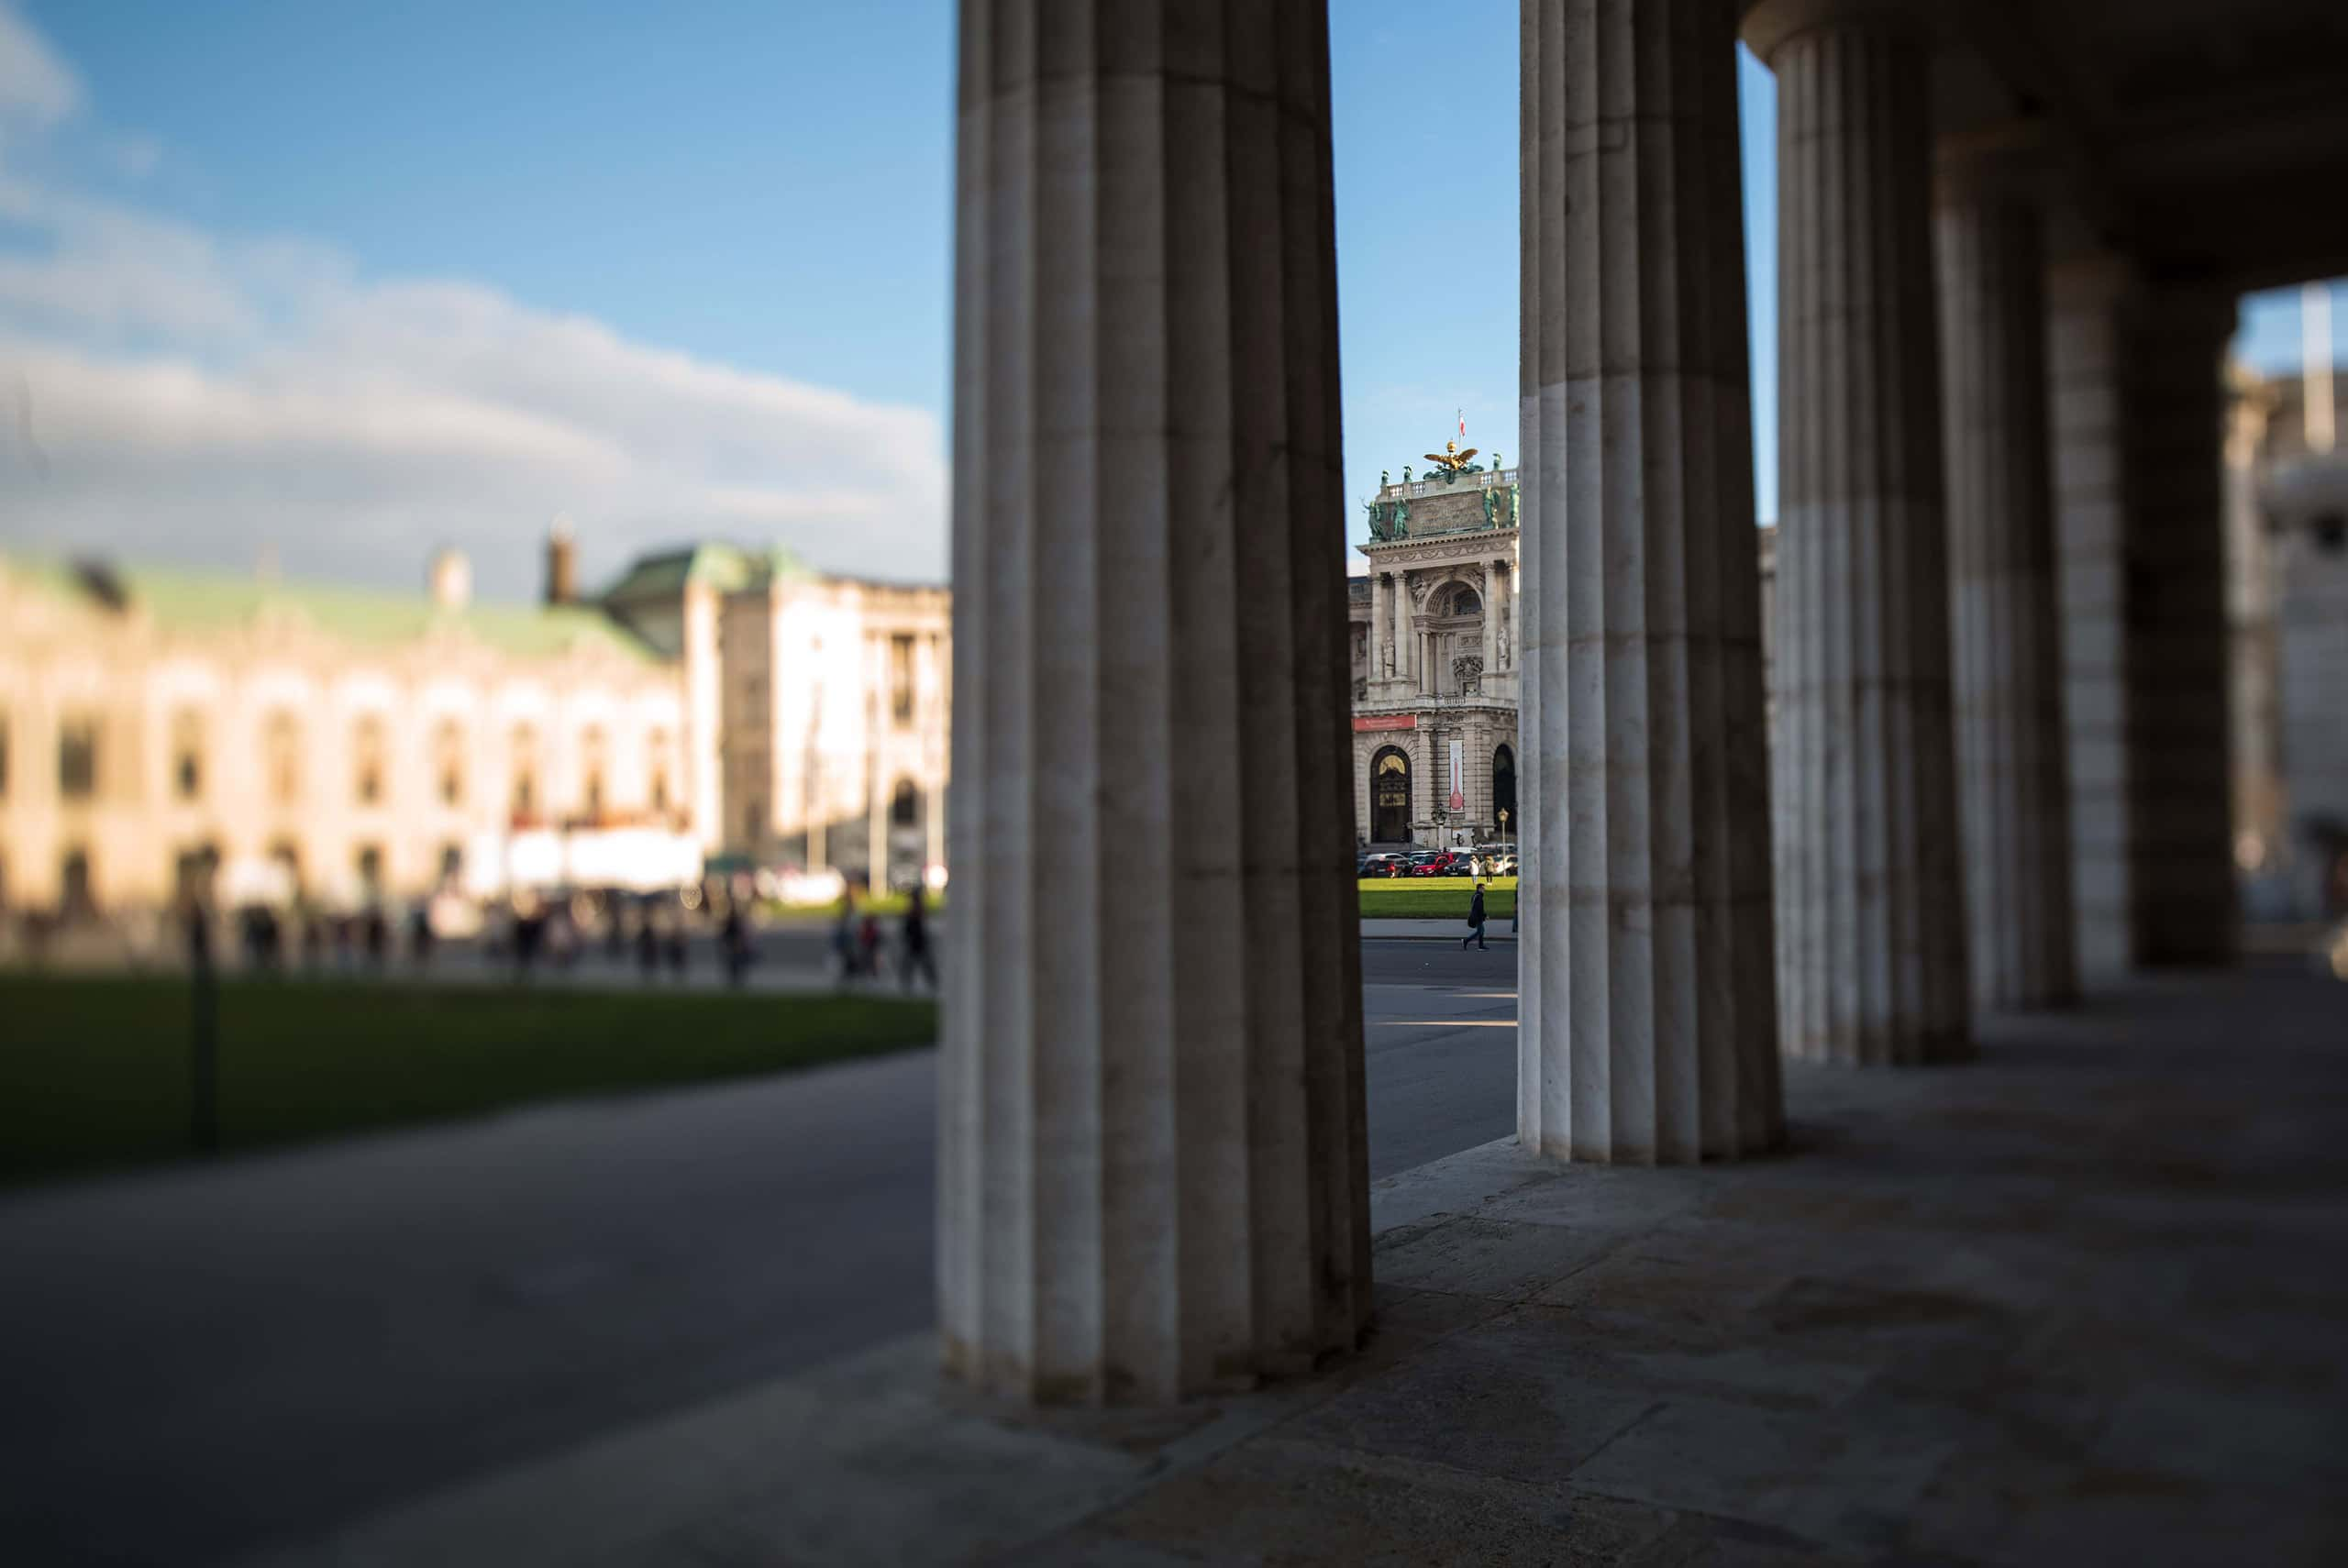 Heldenplatz in Wien mit Säulengang und Passanten